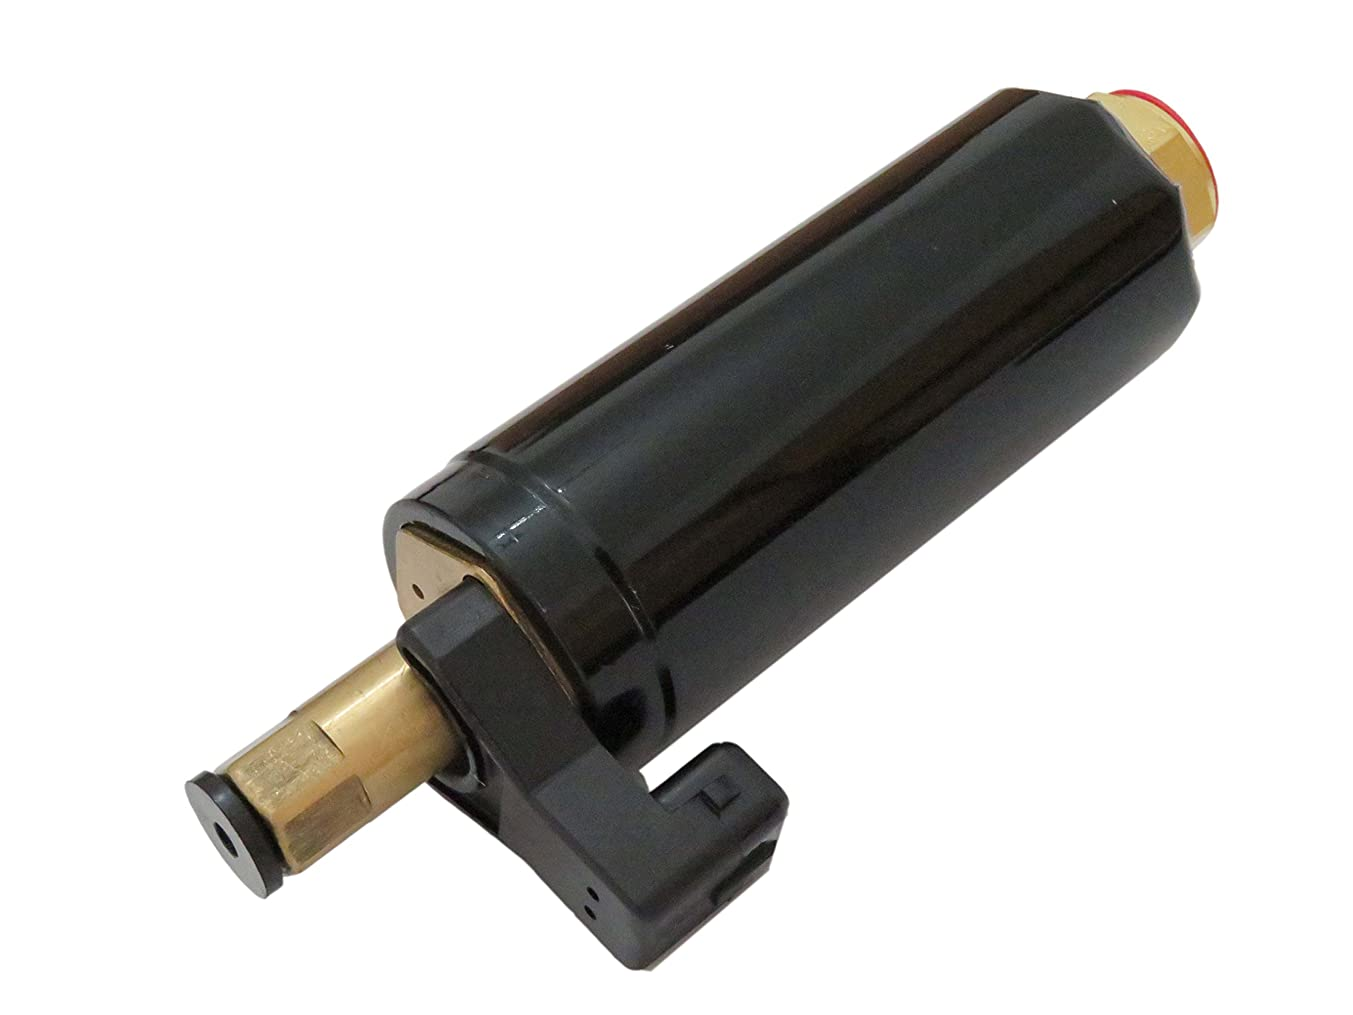 Fuel Pump For OMC Mercruiser Volvo Penta Sierra OE# 18-7326 3857986 3854620 3858261 4.3L 5.0L 5.7L - Low Pressure